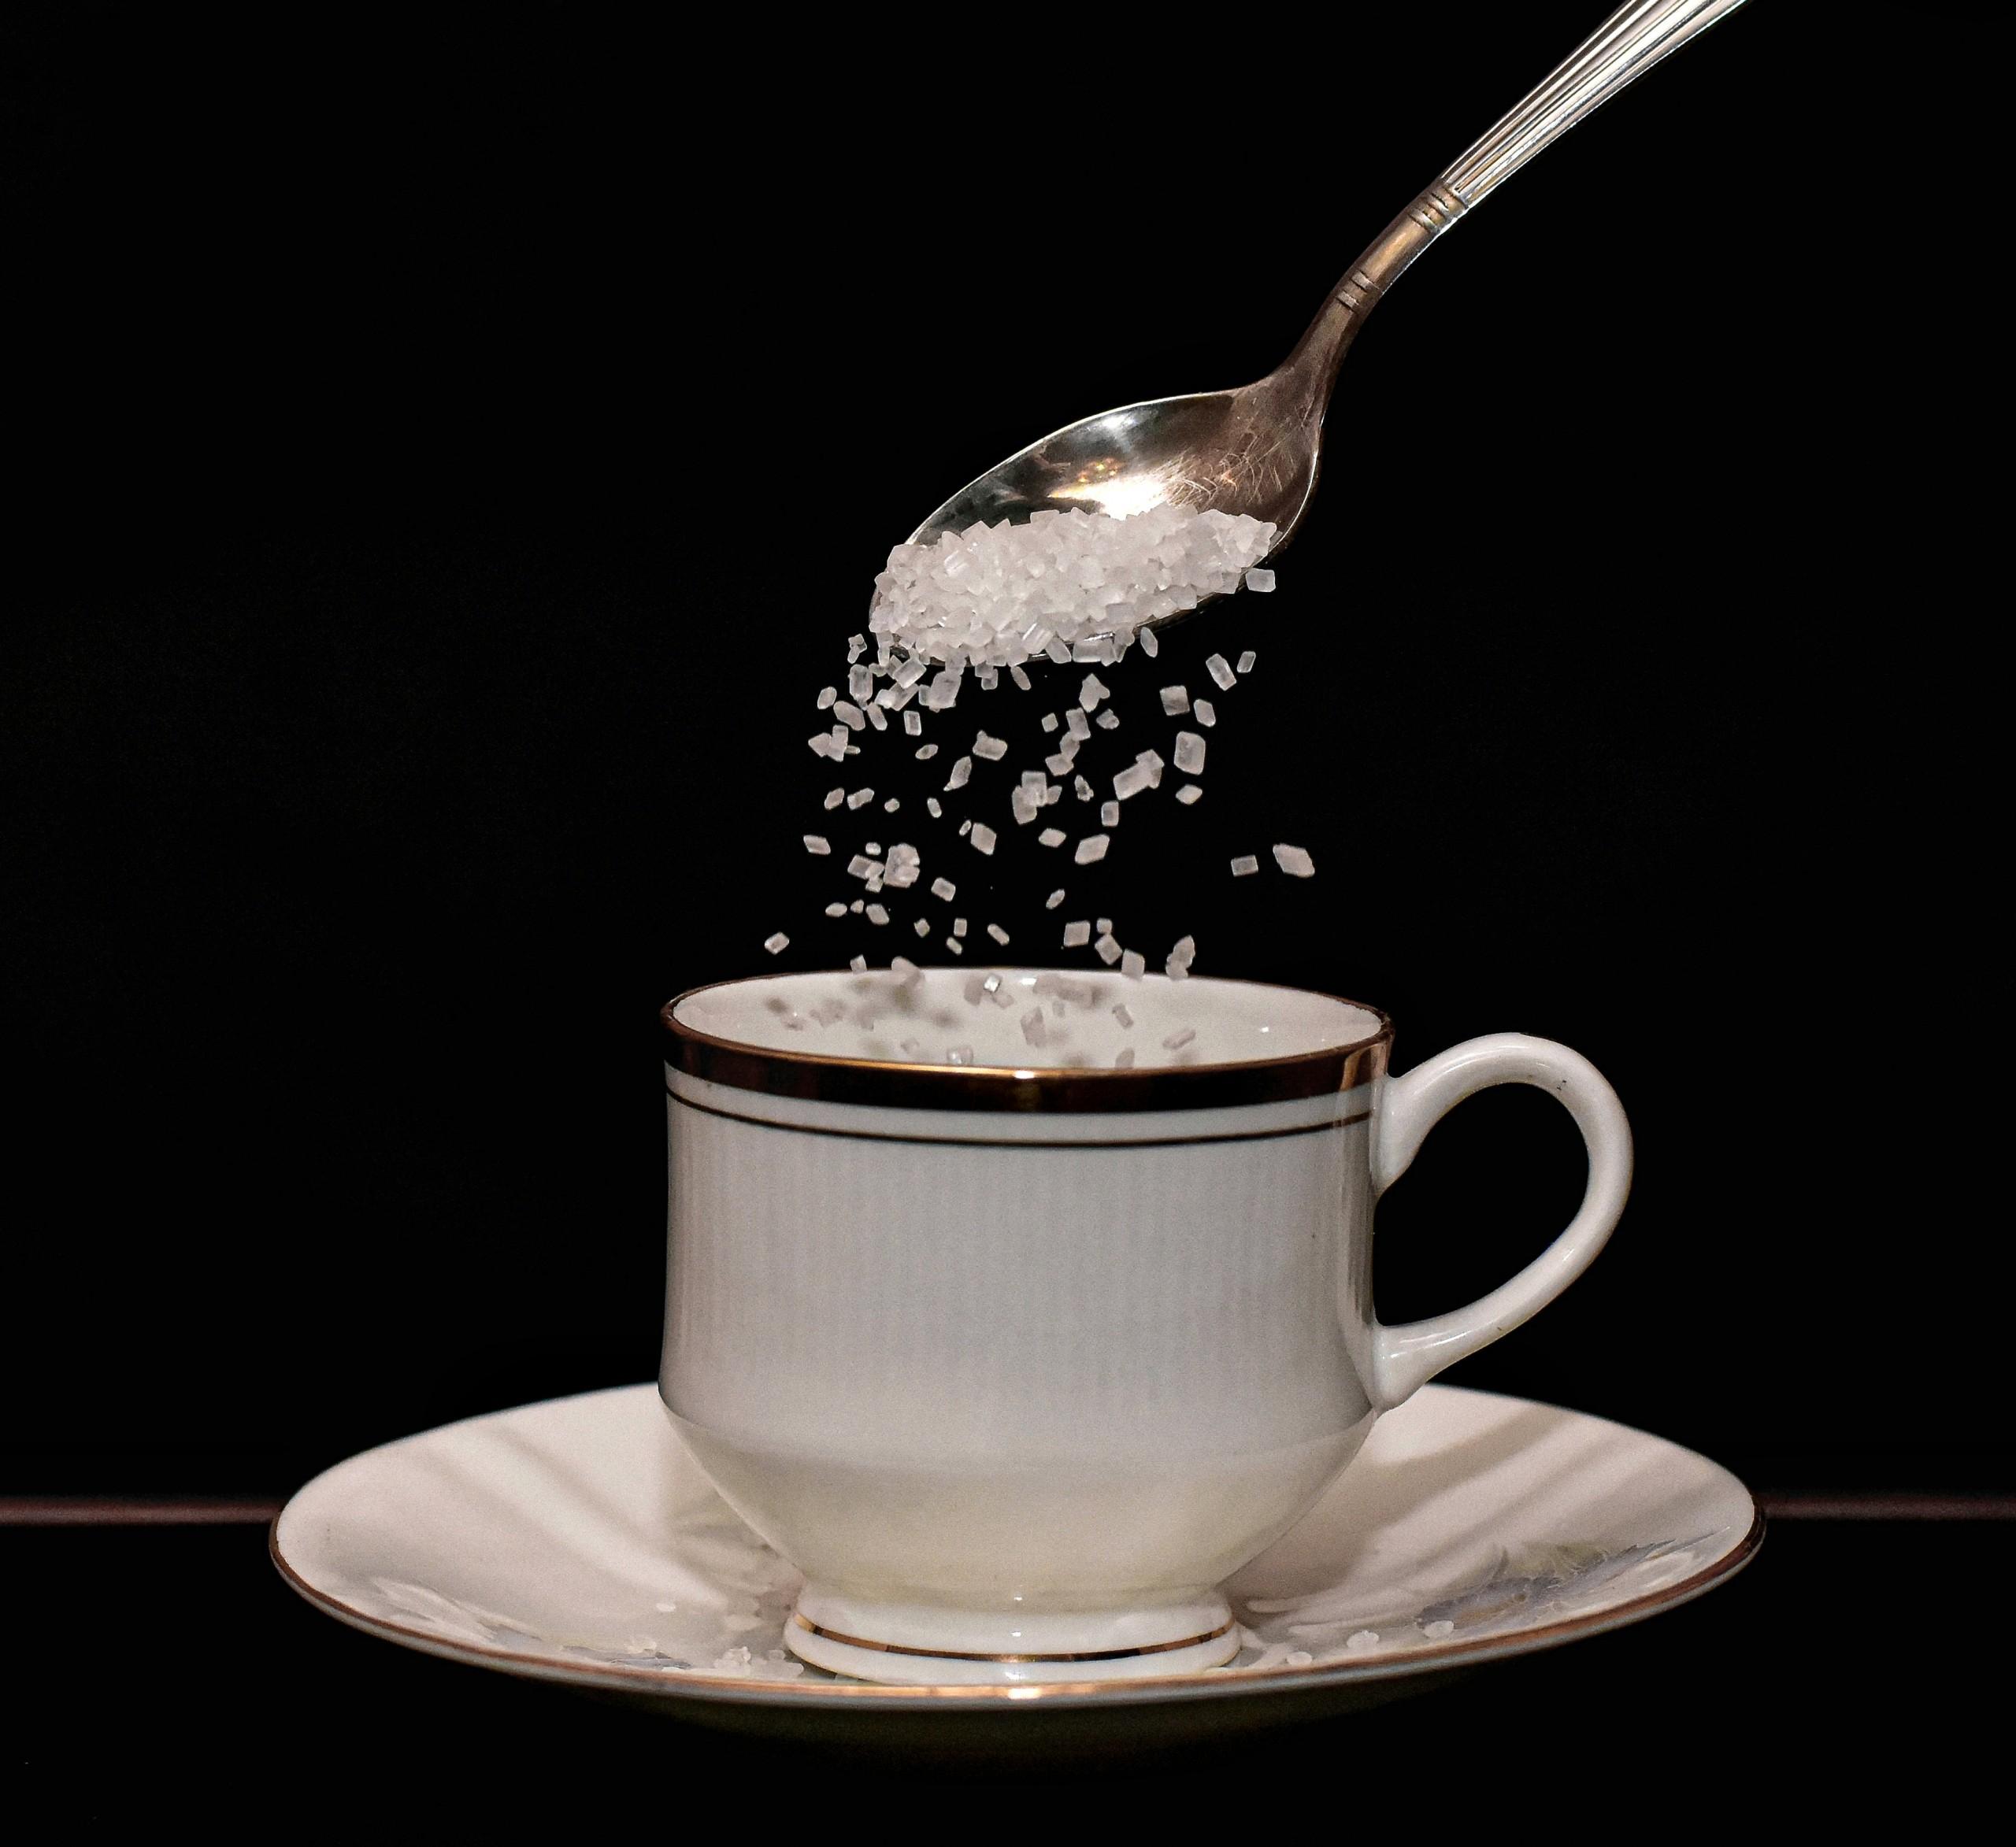 Adding Sugar to Coffee